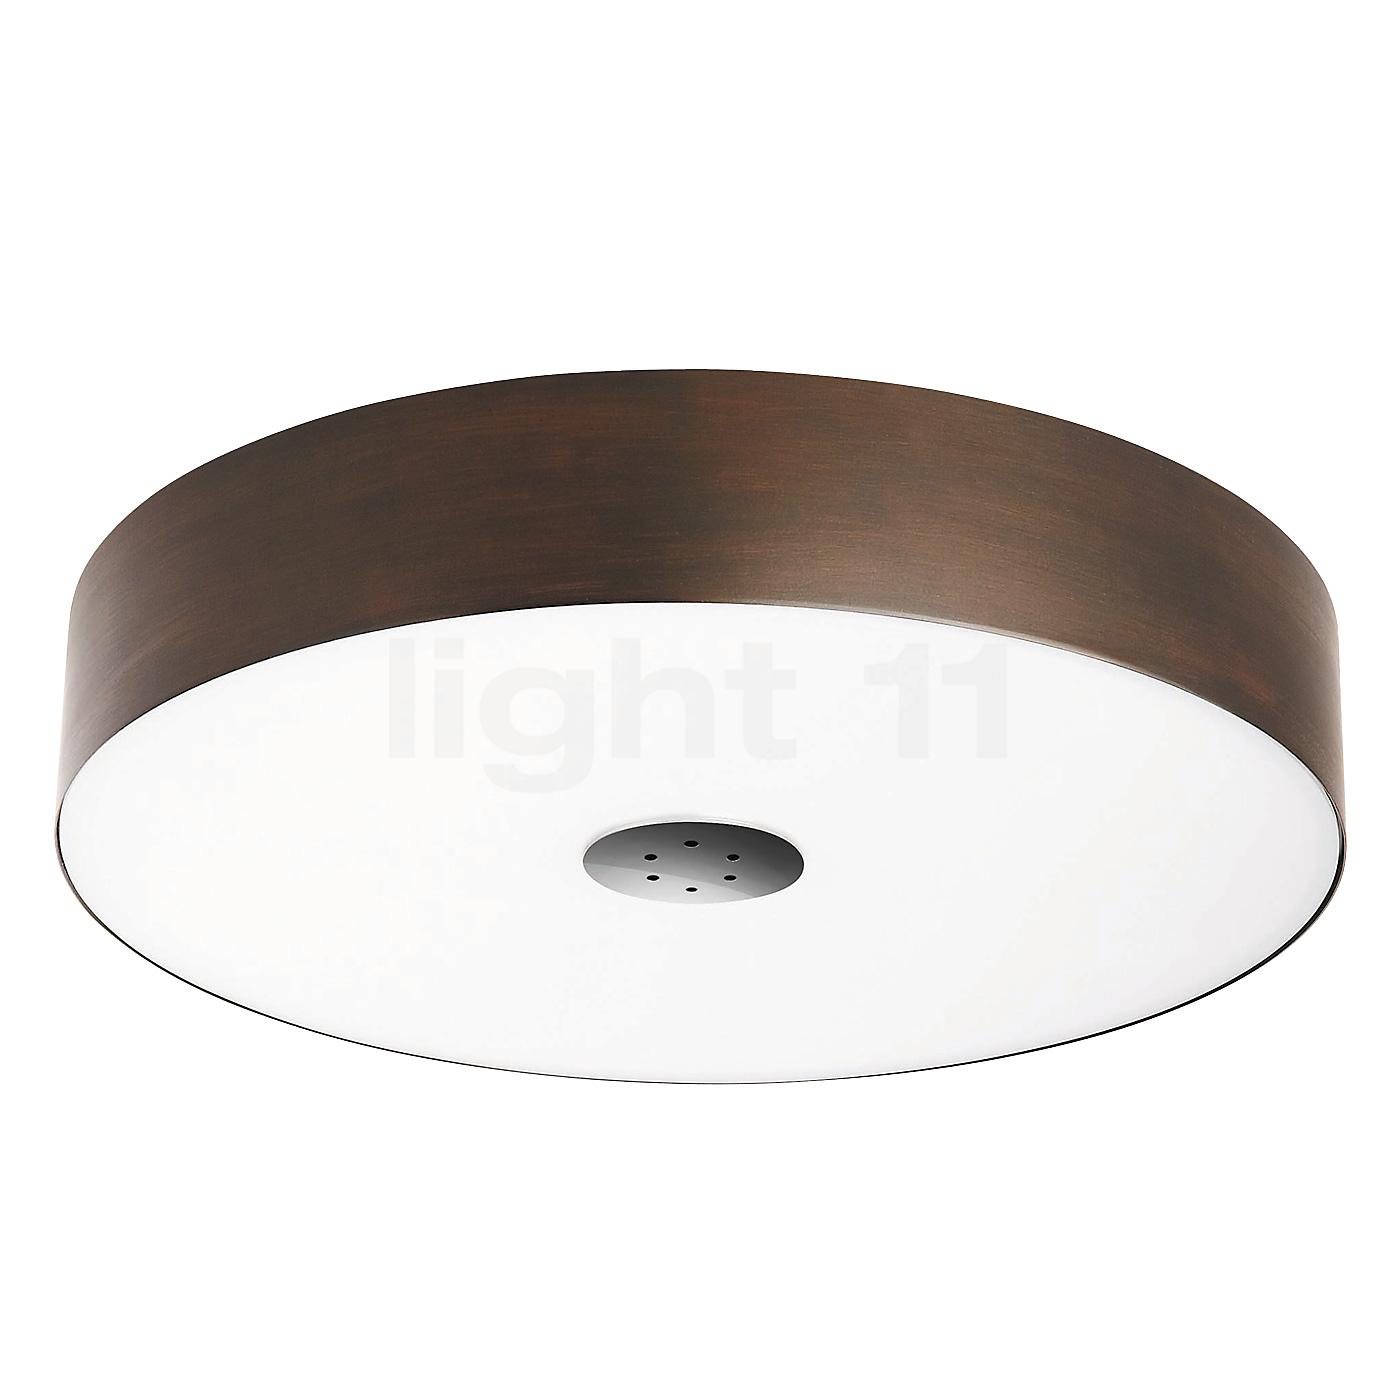 philips ecomoods fair plafondlamp plafondlampen lampen